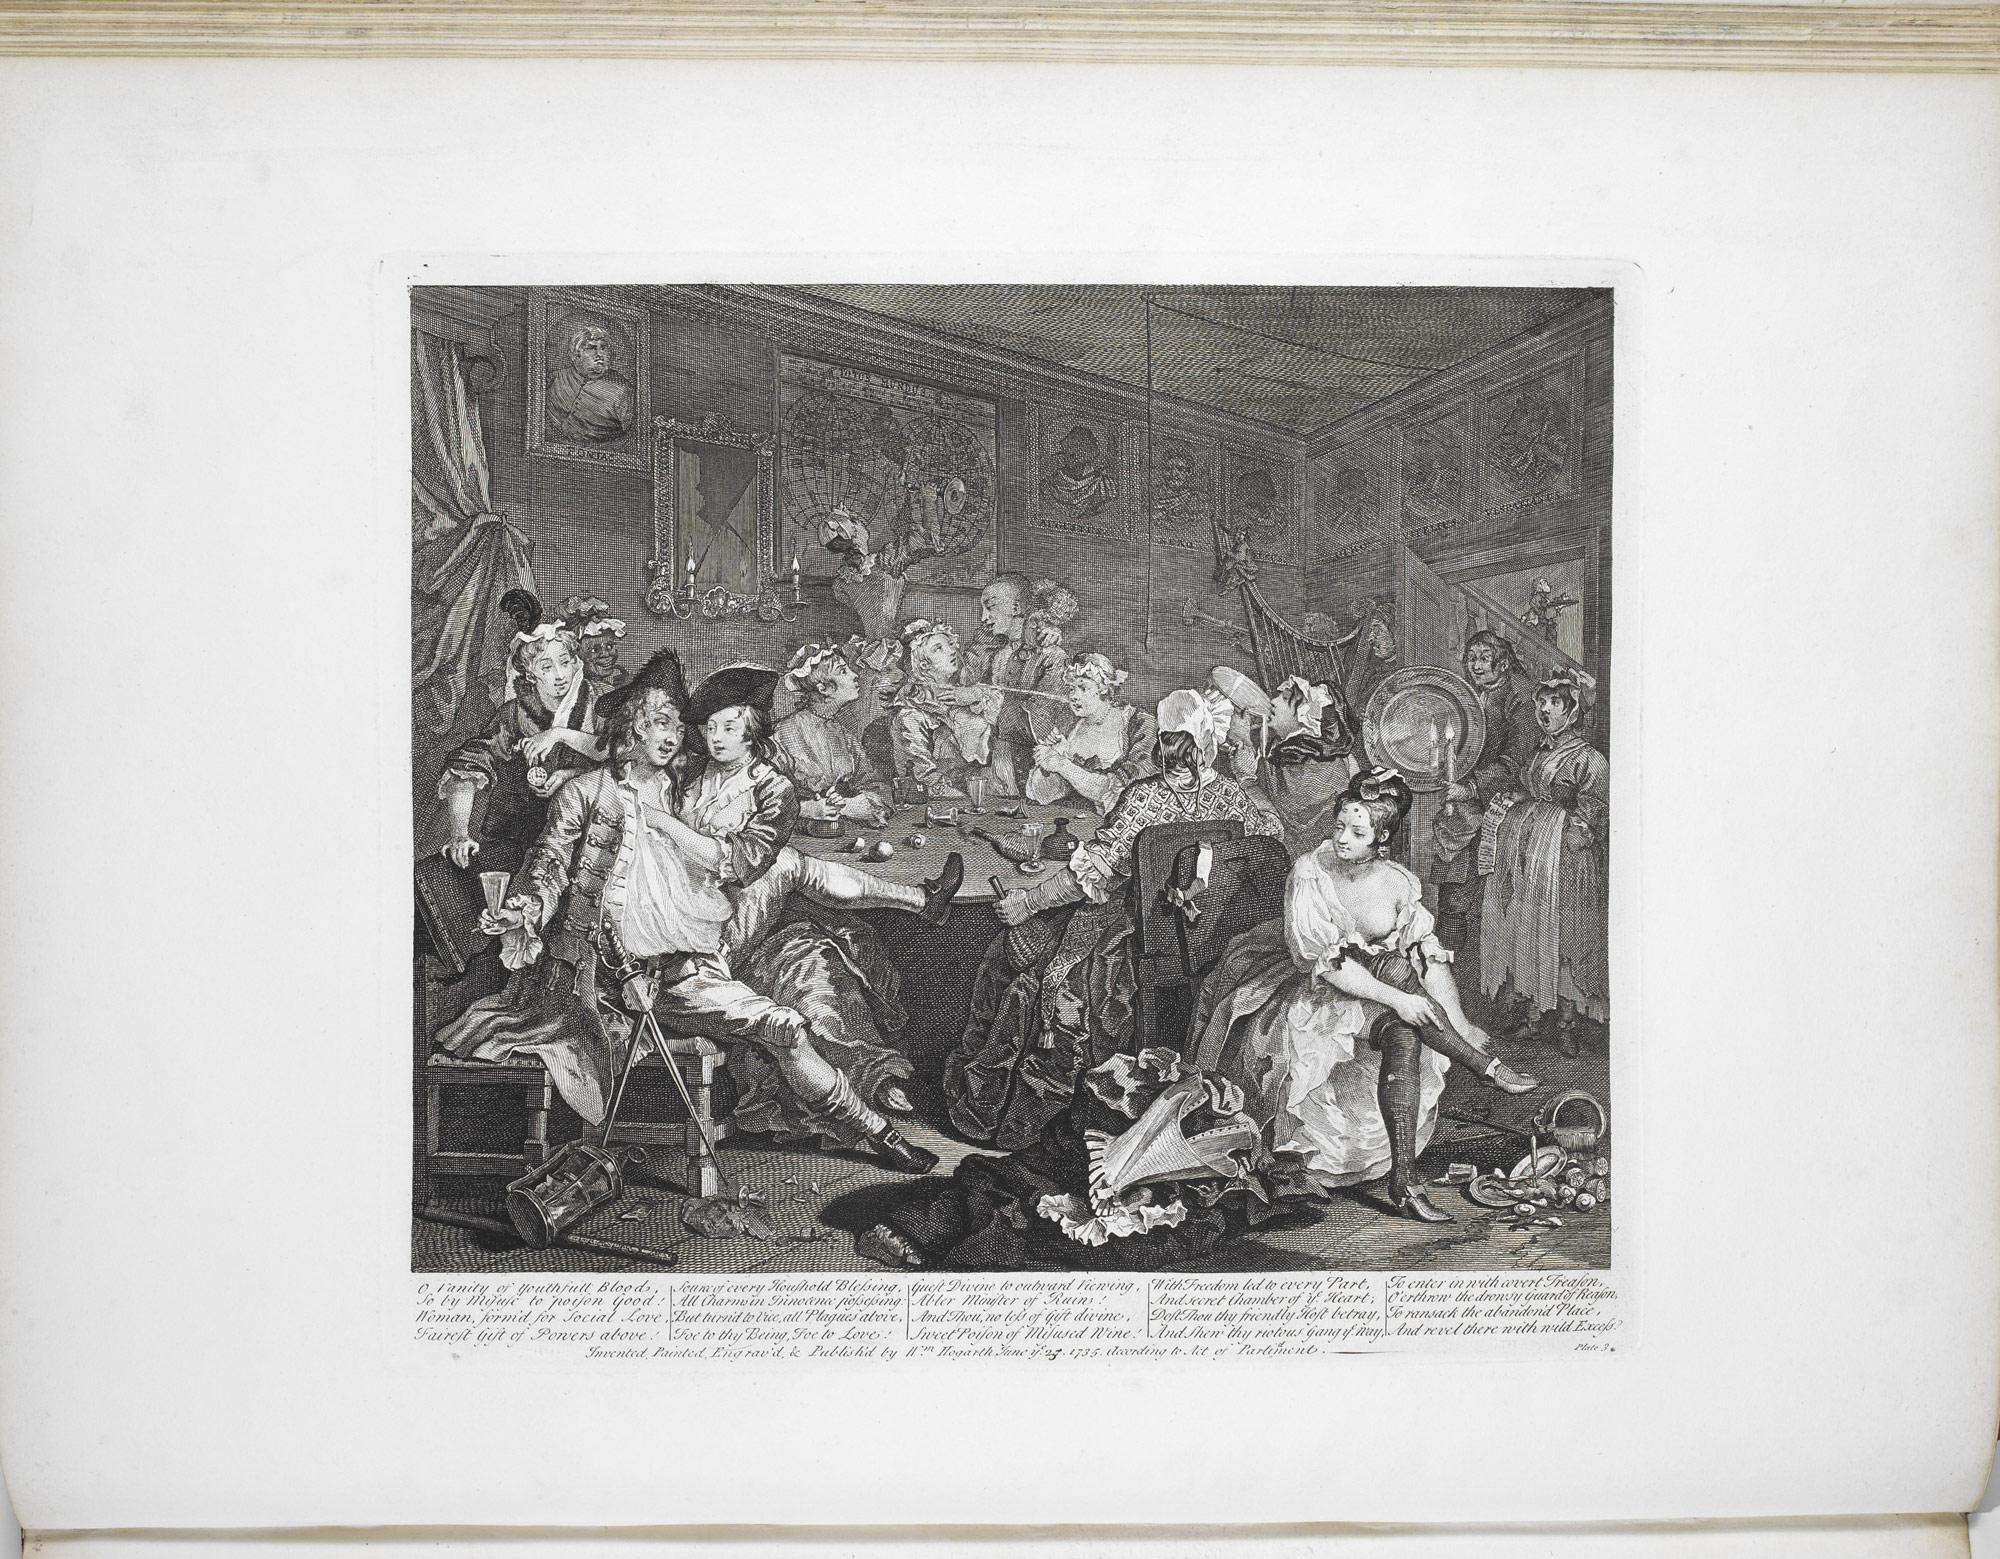 Scene of drunkenness and debauchery from Hogarth's Rake's Progress